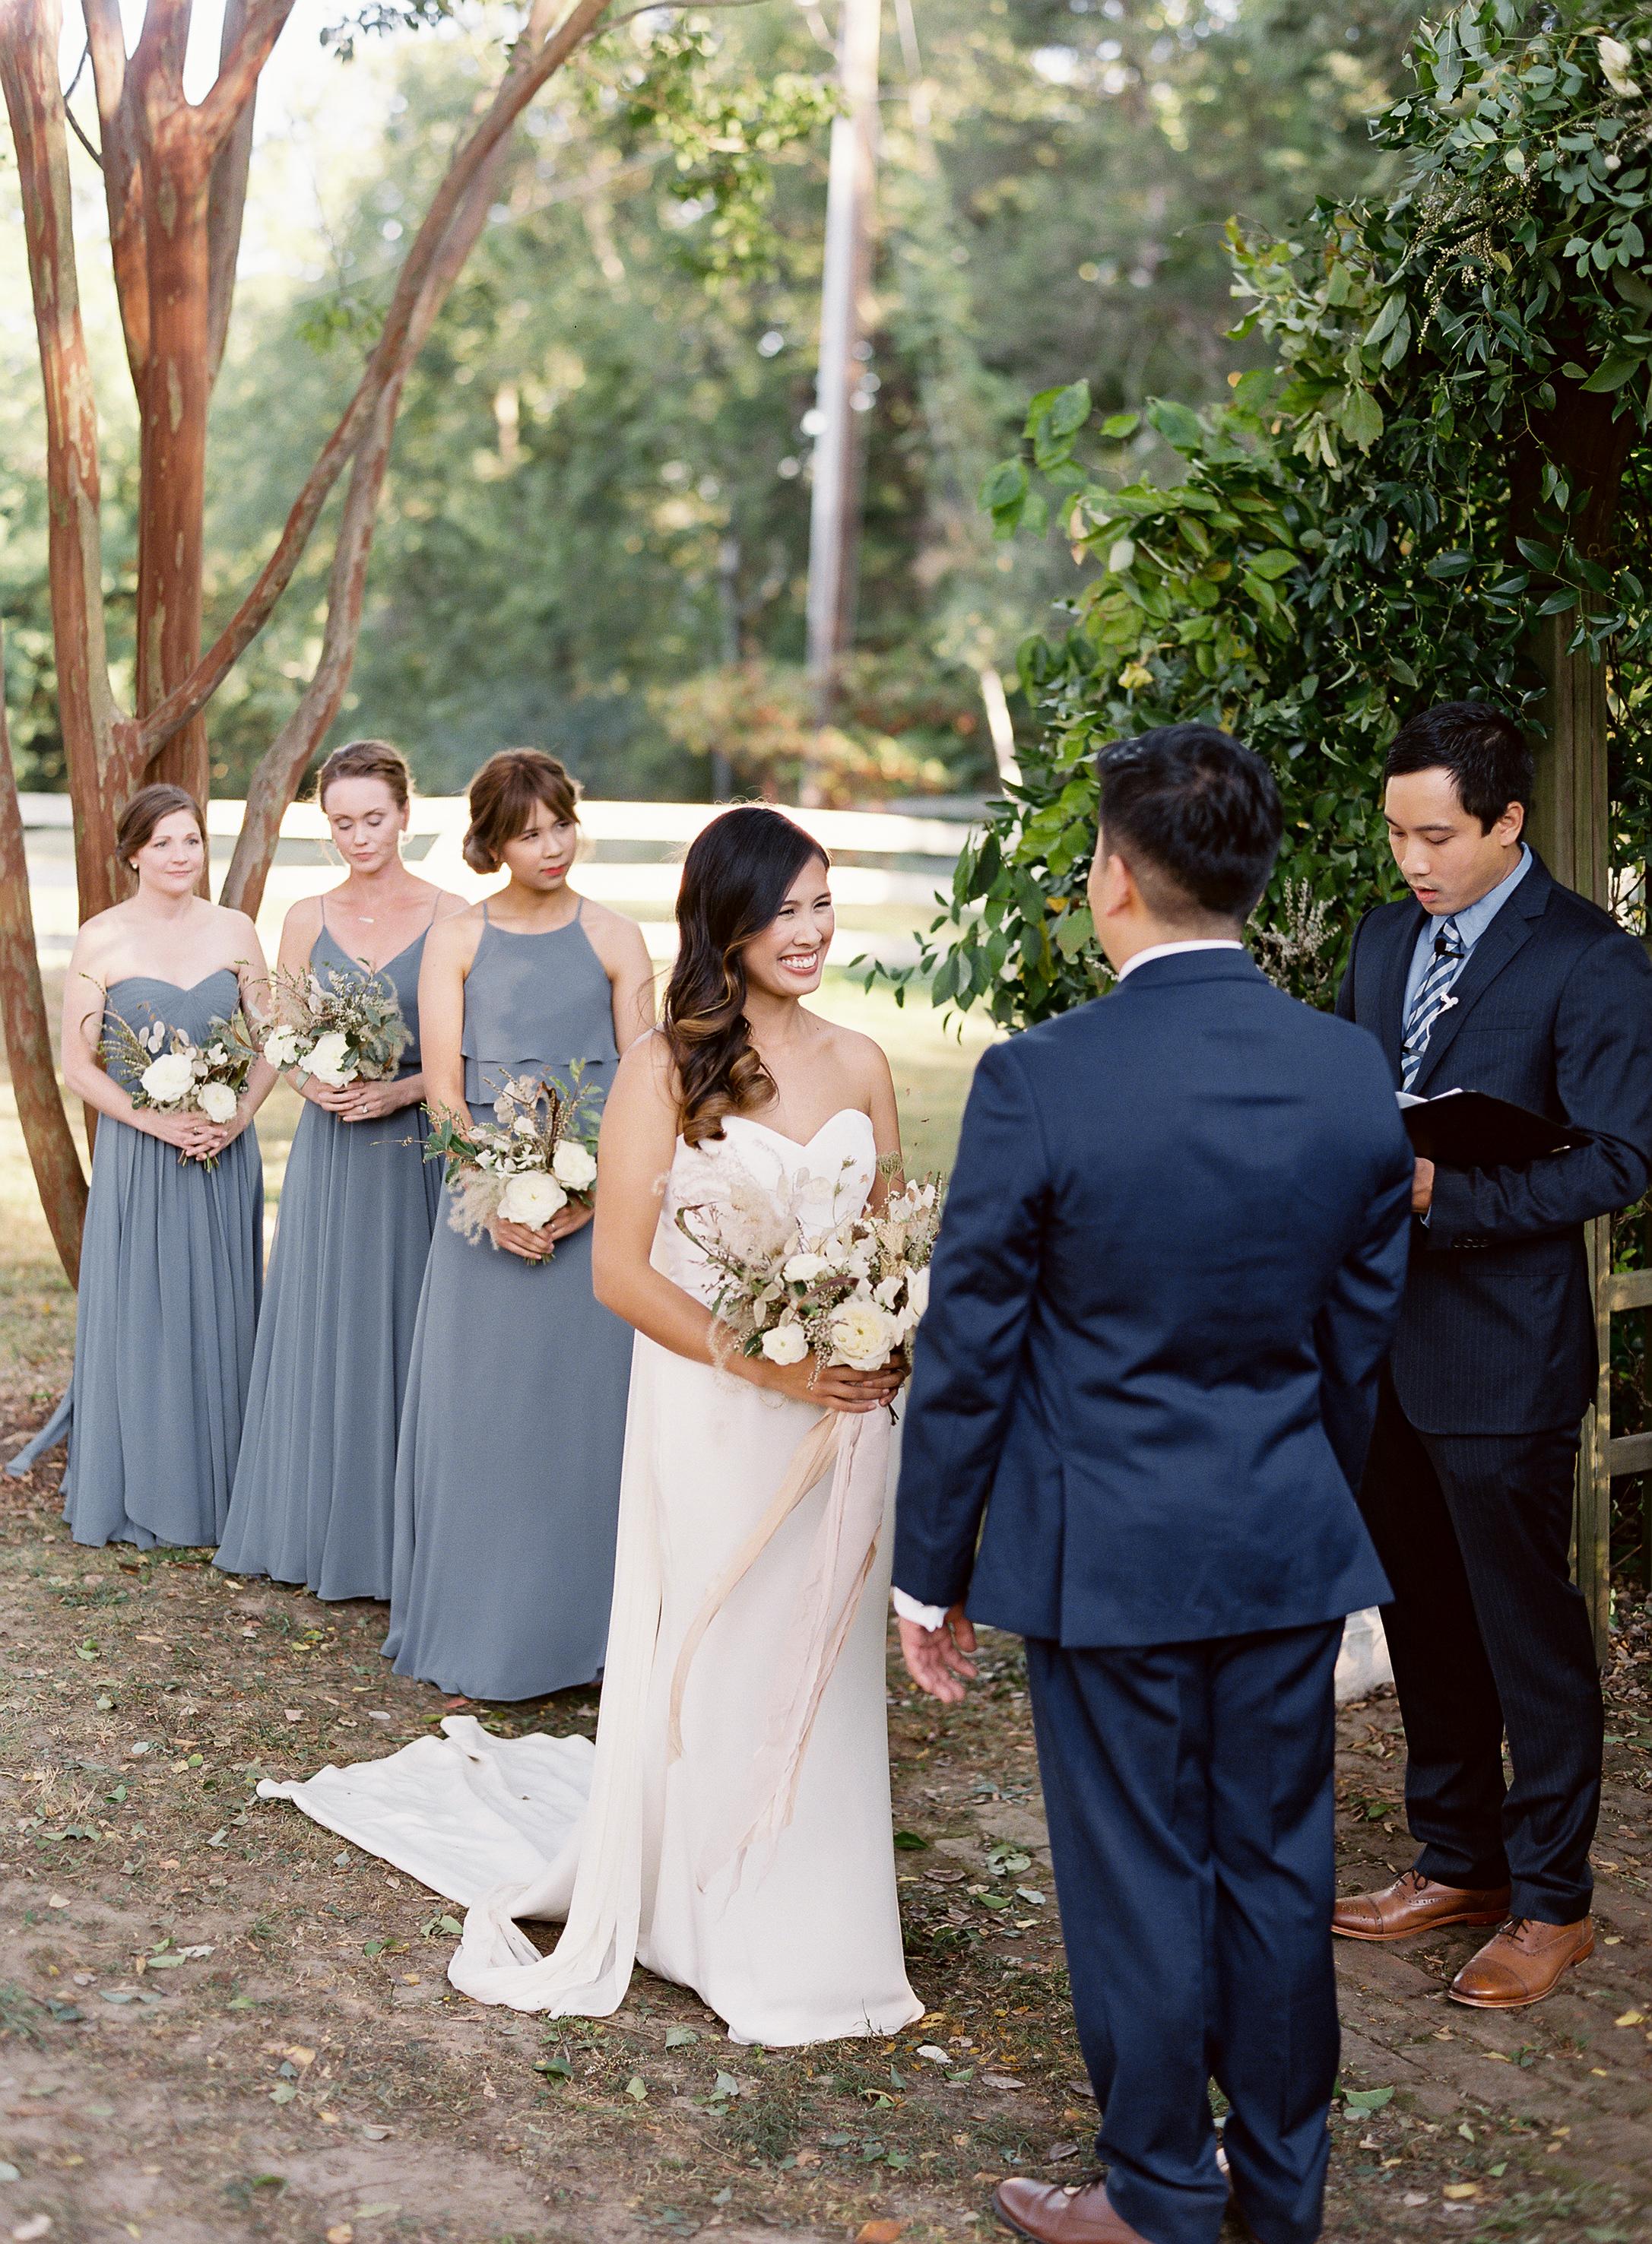 Vicki_Grafton_Photography_Wedding-427.jpg